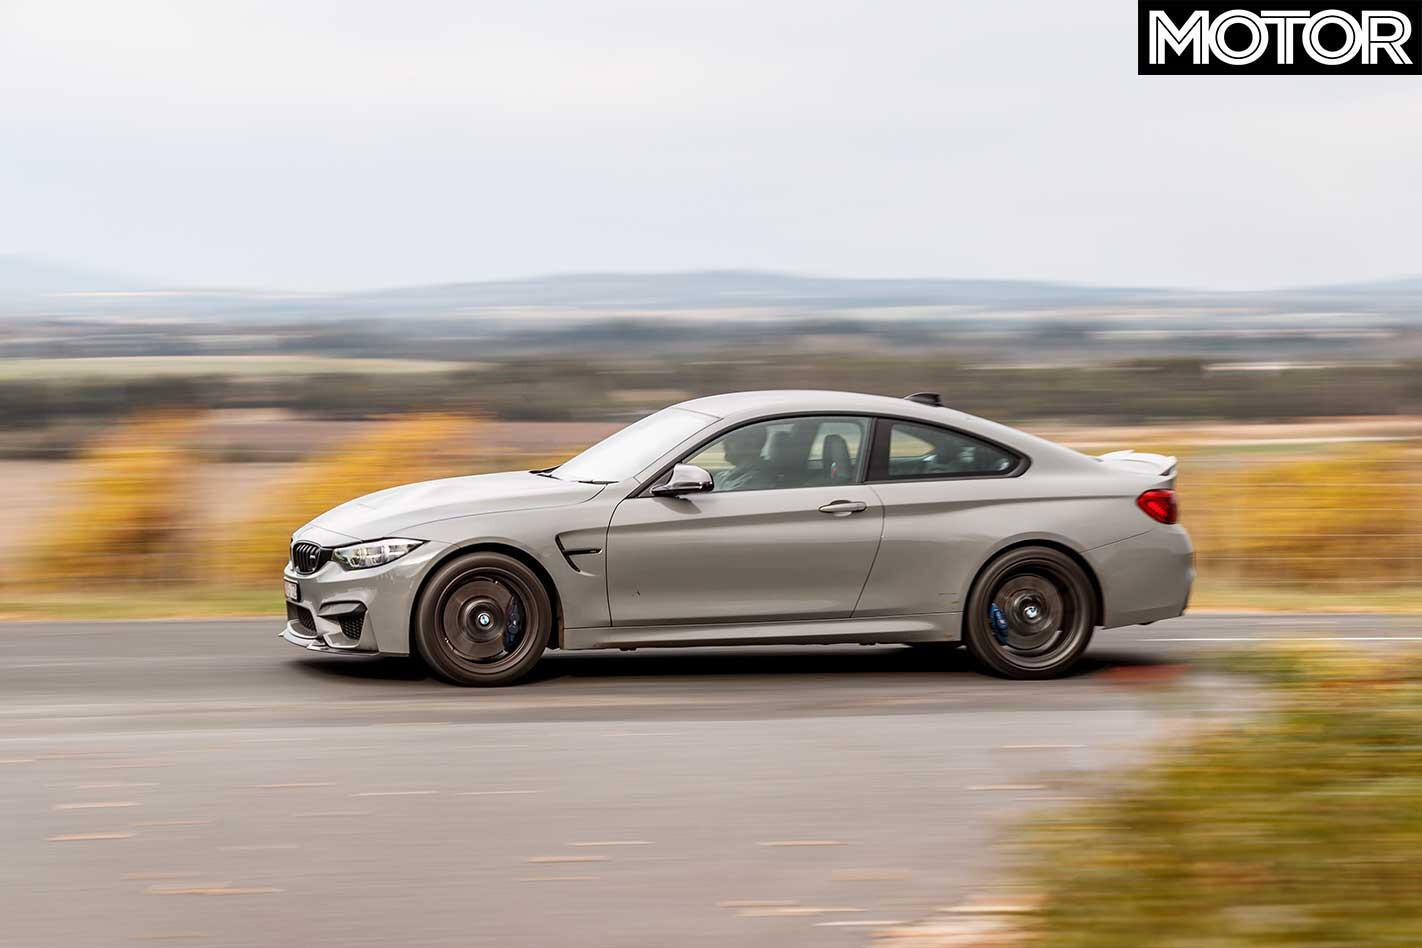 2018 BMW M 4 CS Performance Acceleration Jpg